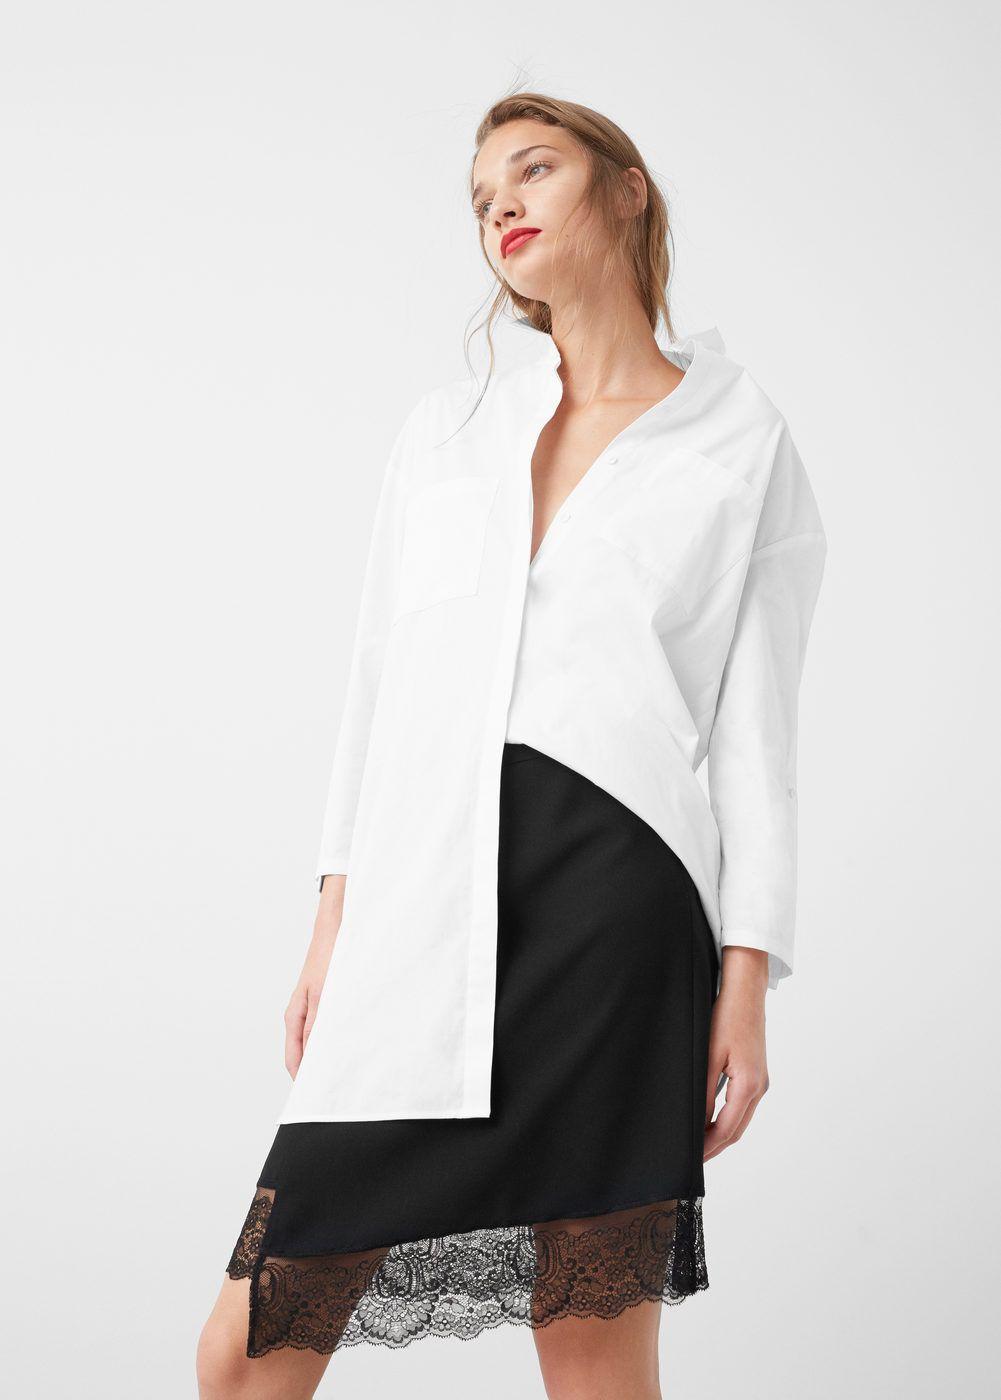 Lace skirt - Women   Closet wishes   Pinterest   Vetements, Jupe ... 90b7635c28d7